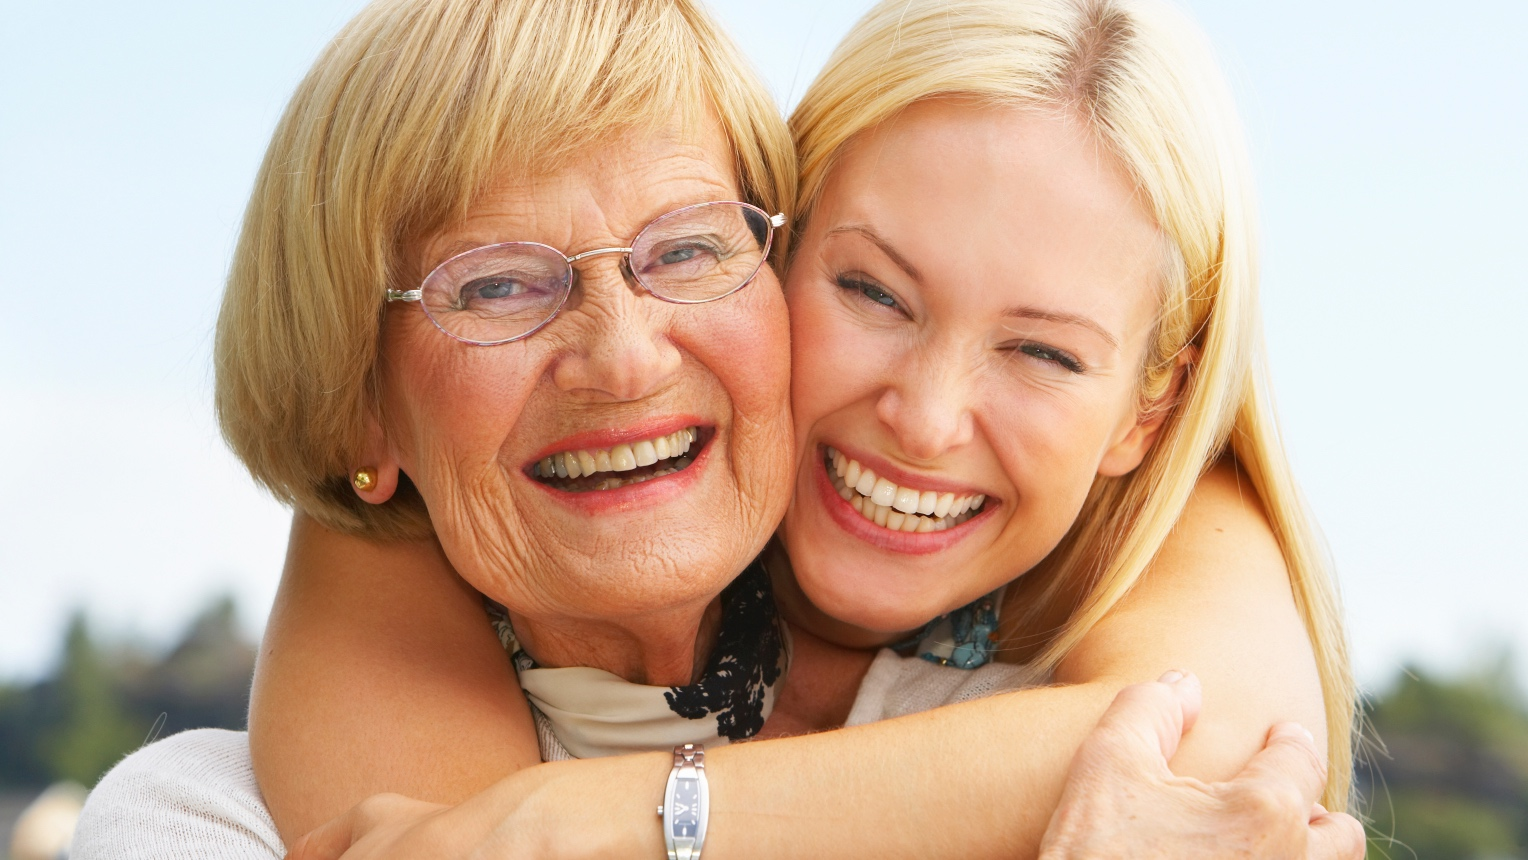 Senior and Daughter smiling.jpg